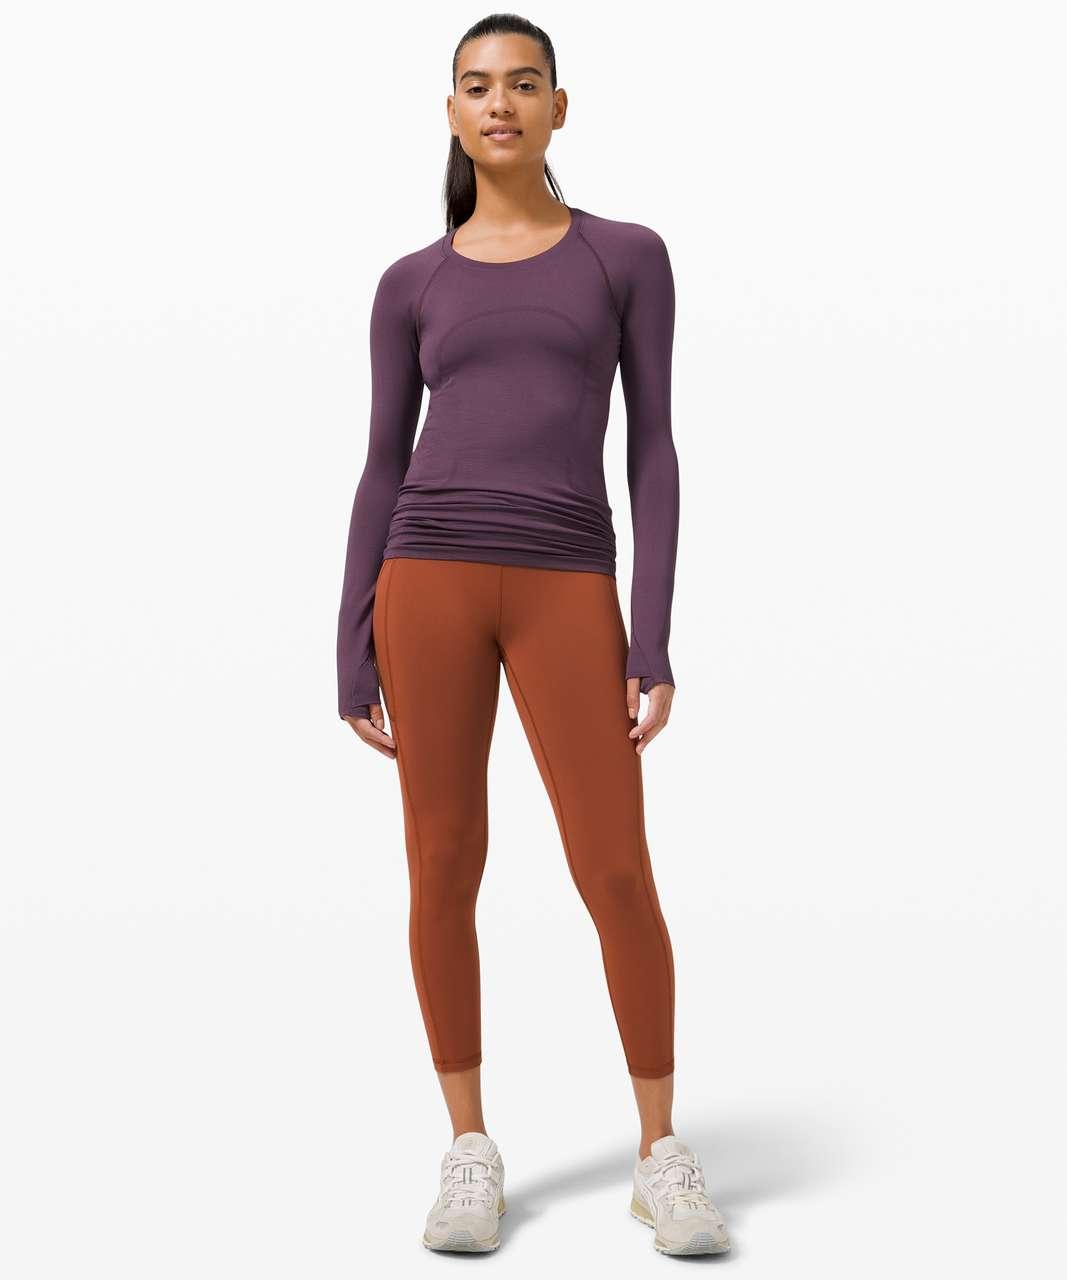 Lululemon Swiftly Tech Long Sleeve 2.0 - Grape Thistle / Grape Thistle